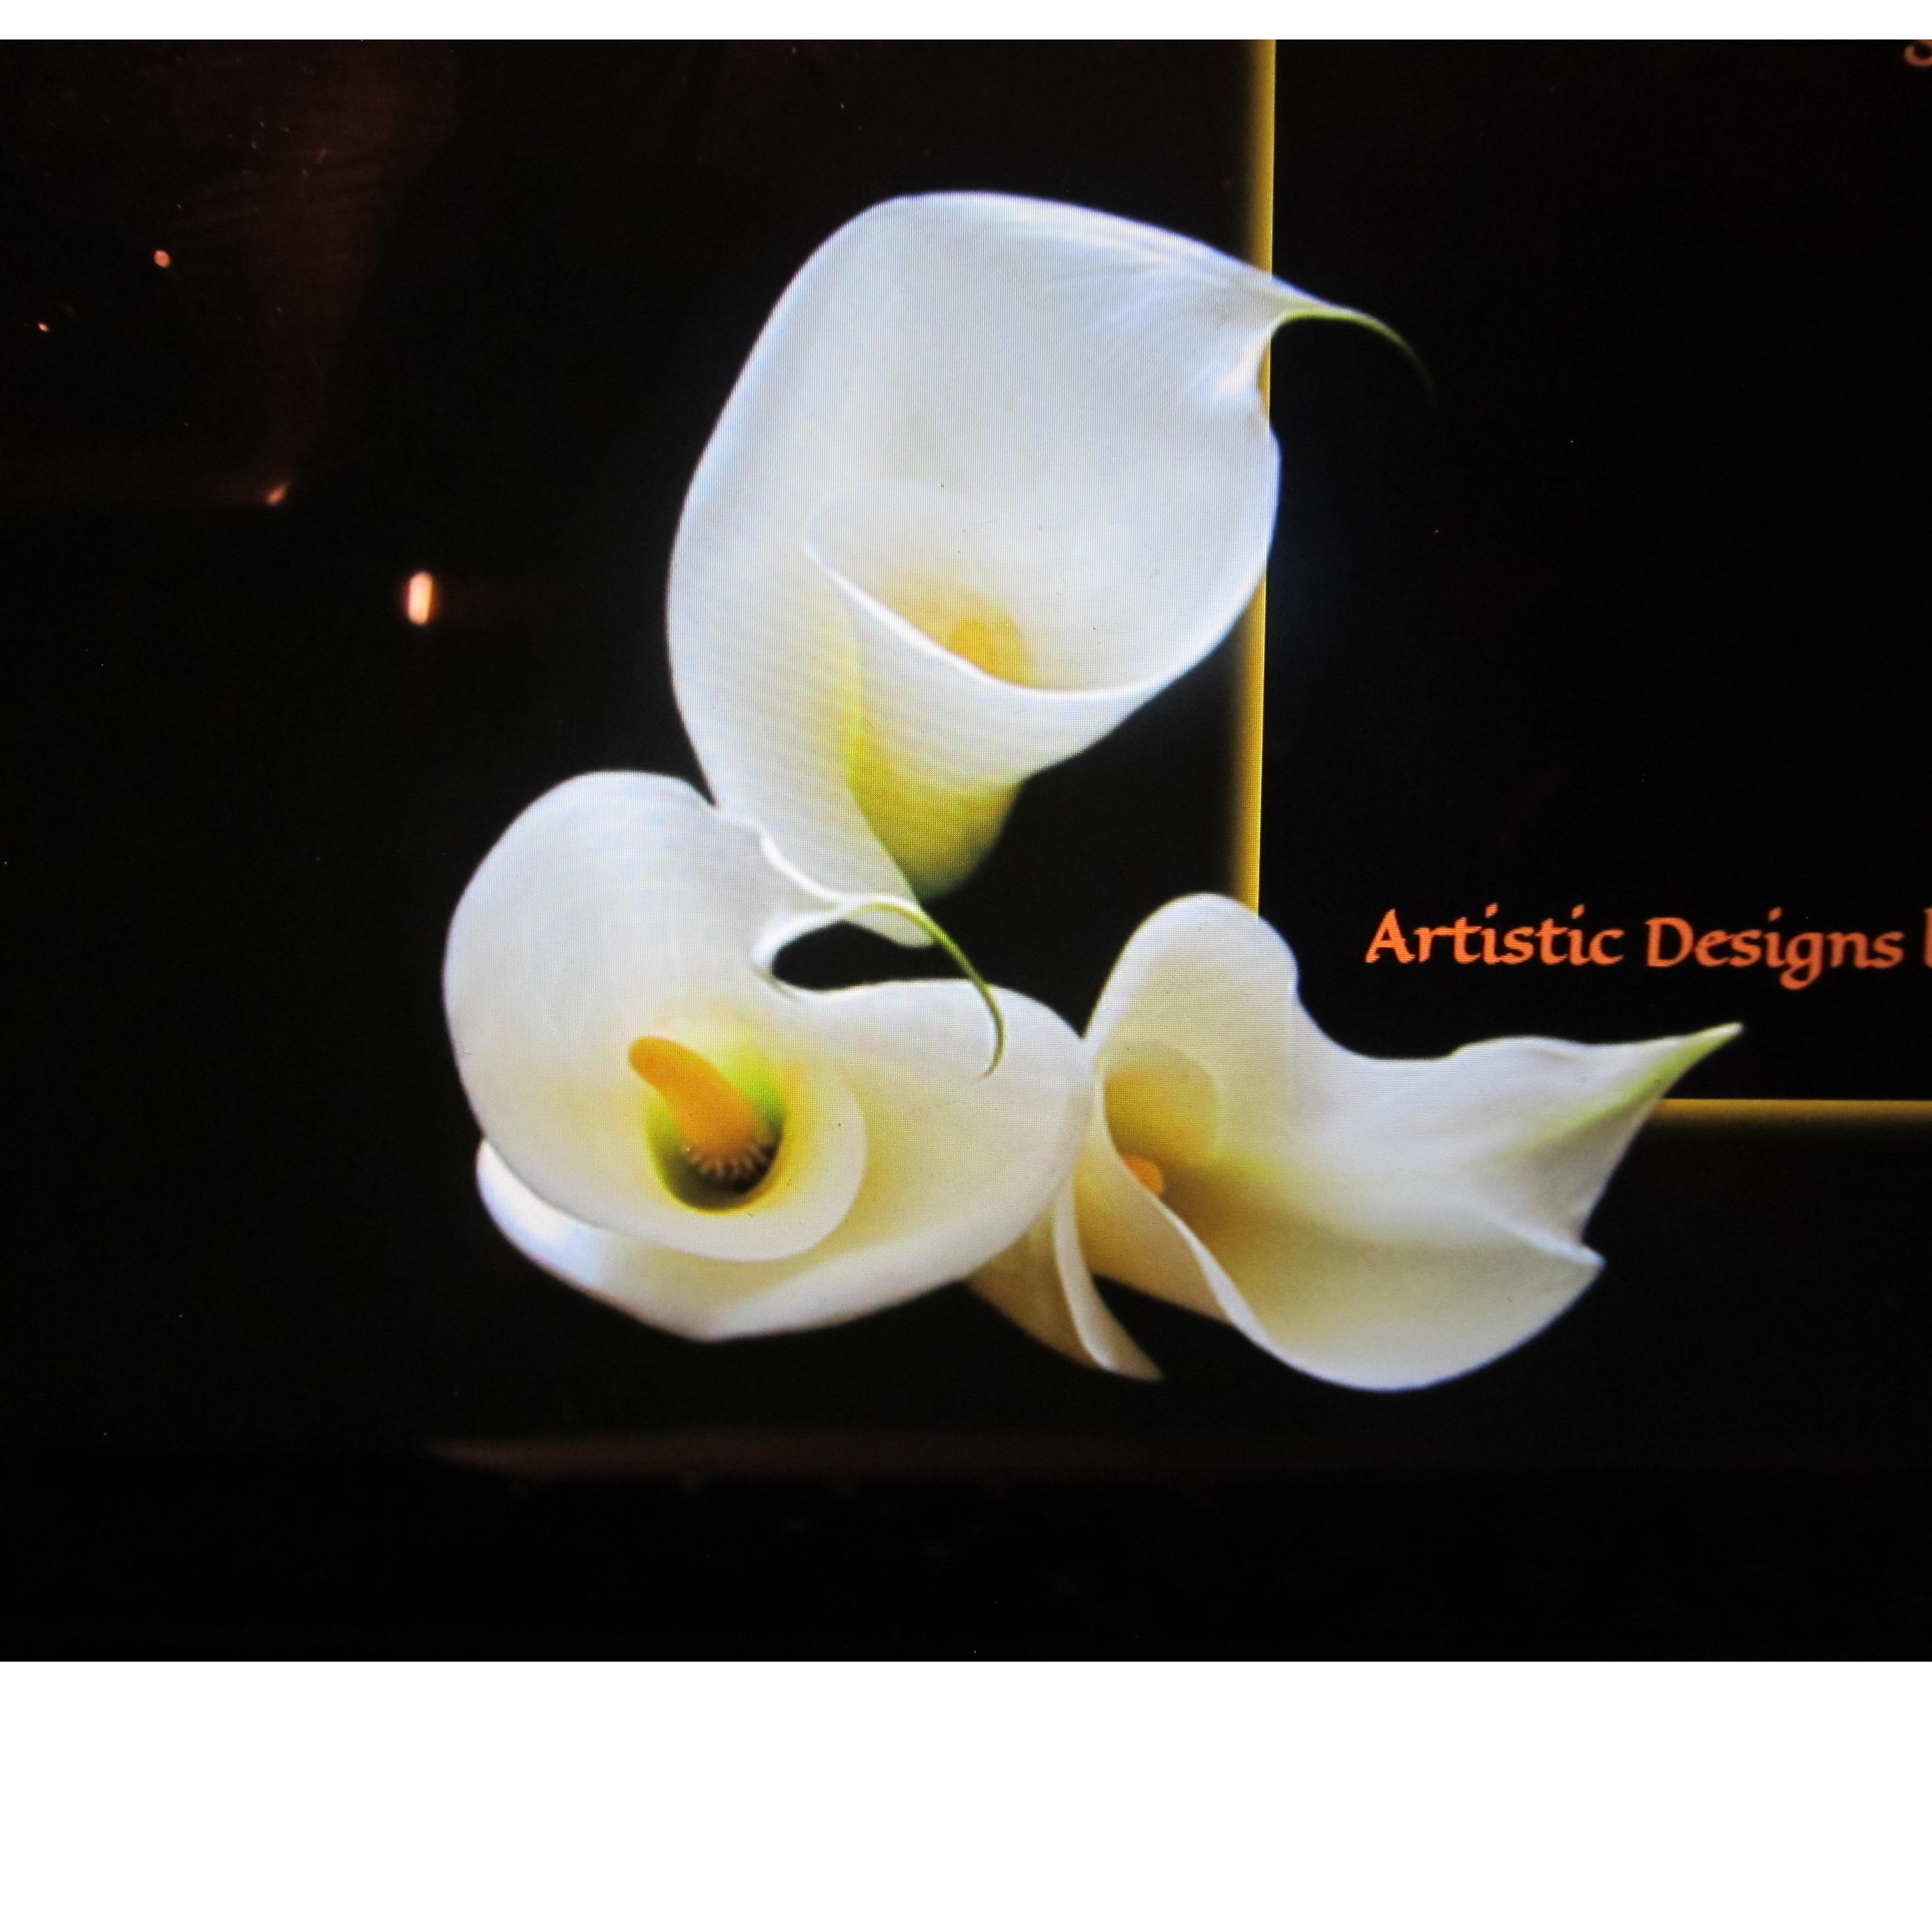 Artistic Floral Designs by Brenda